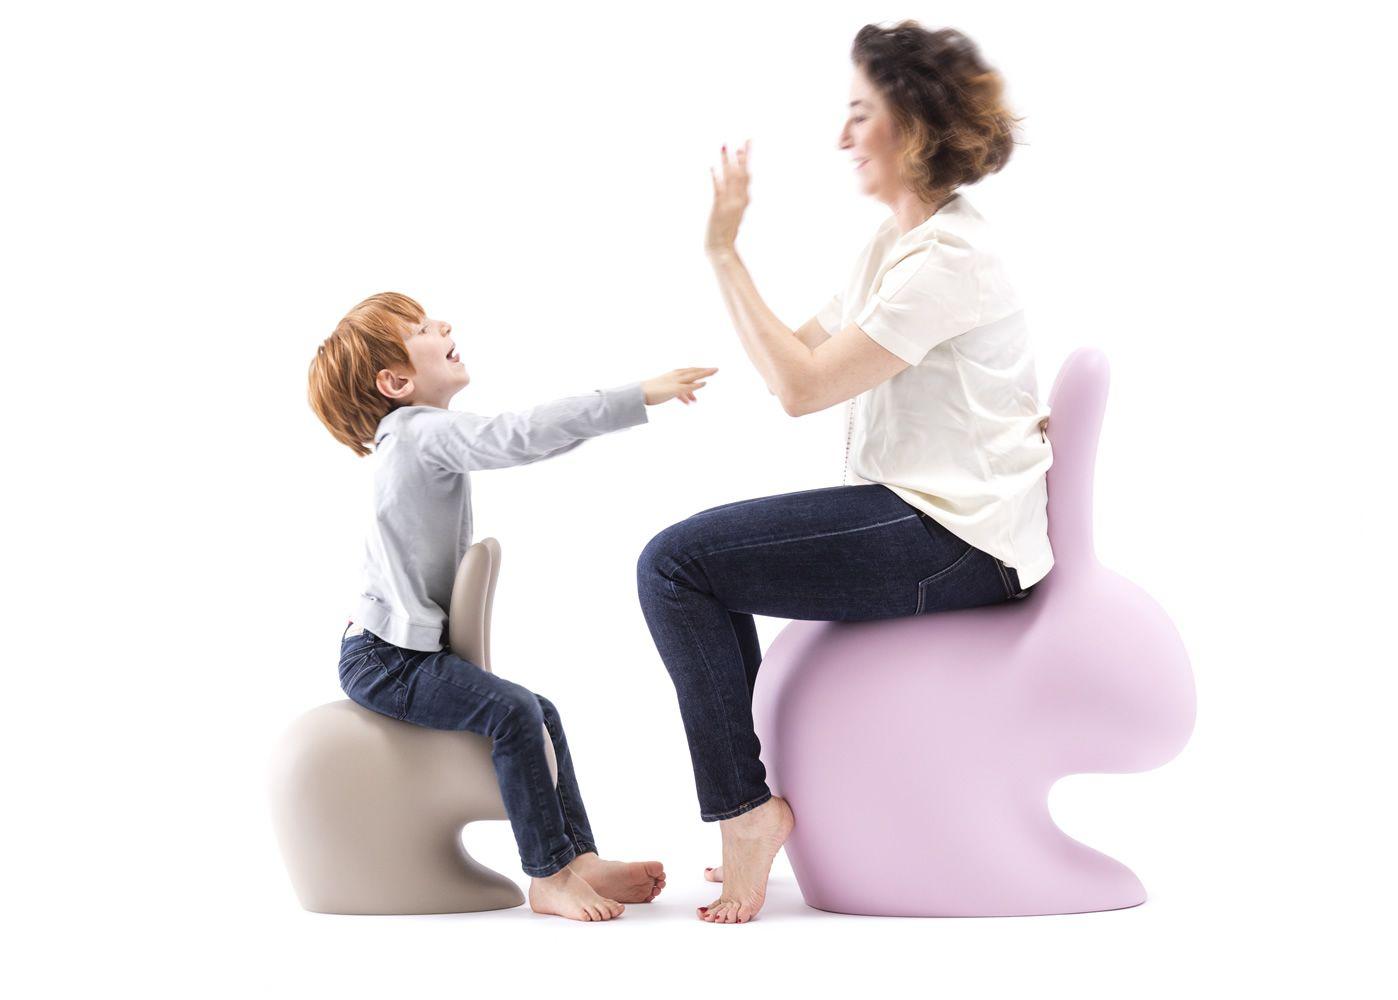 Rabbit chair baby qeeboo kaninchenf rmiger stuhl aus polyethylen auch f r den garten sediarreda - Stuhl fur kinder ...